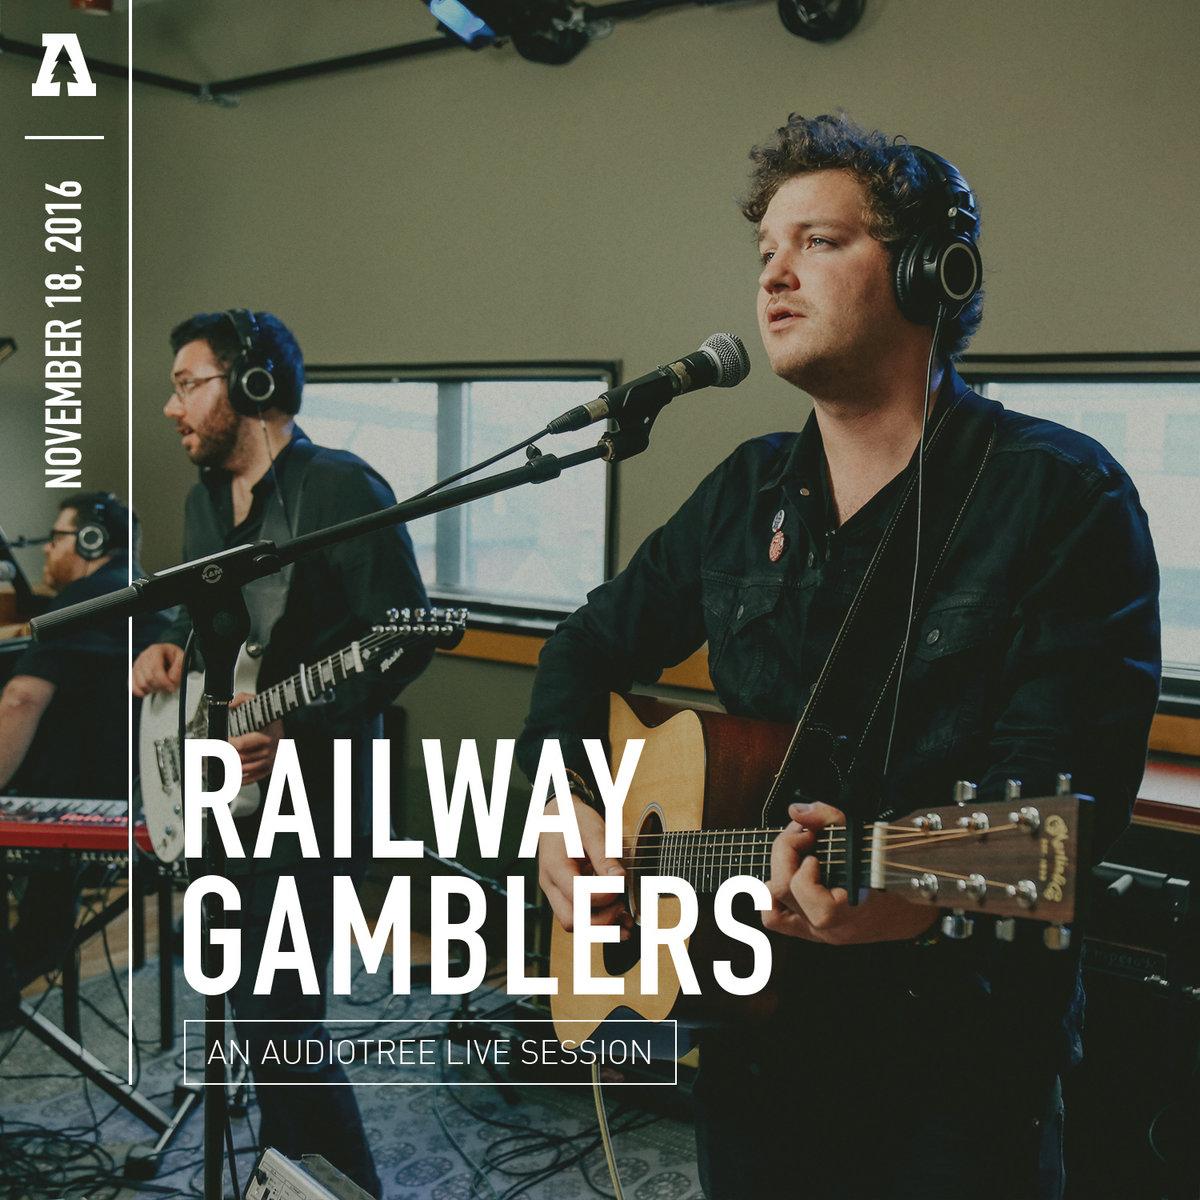 Railway Gamblers